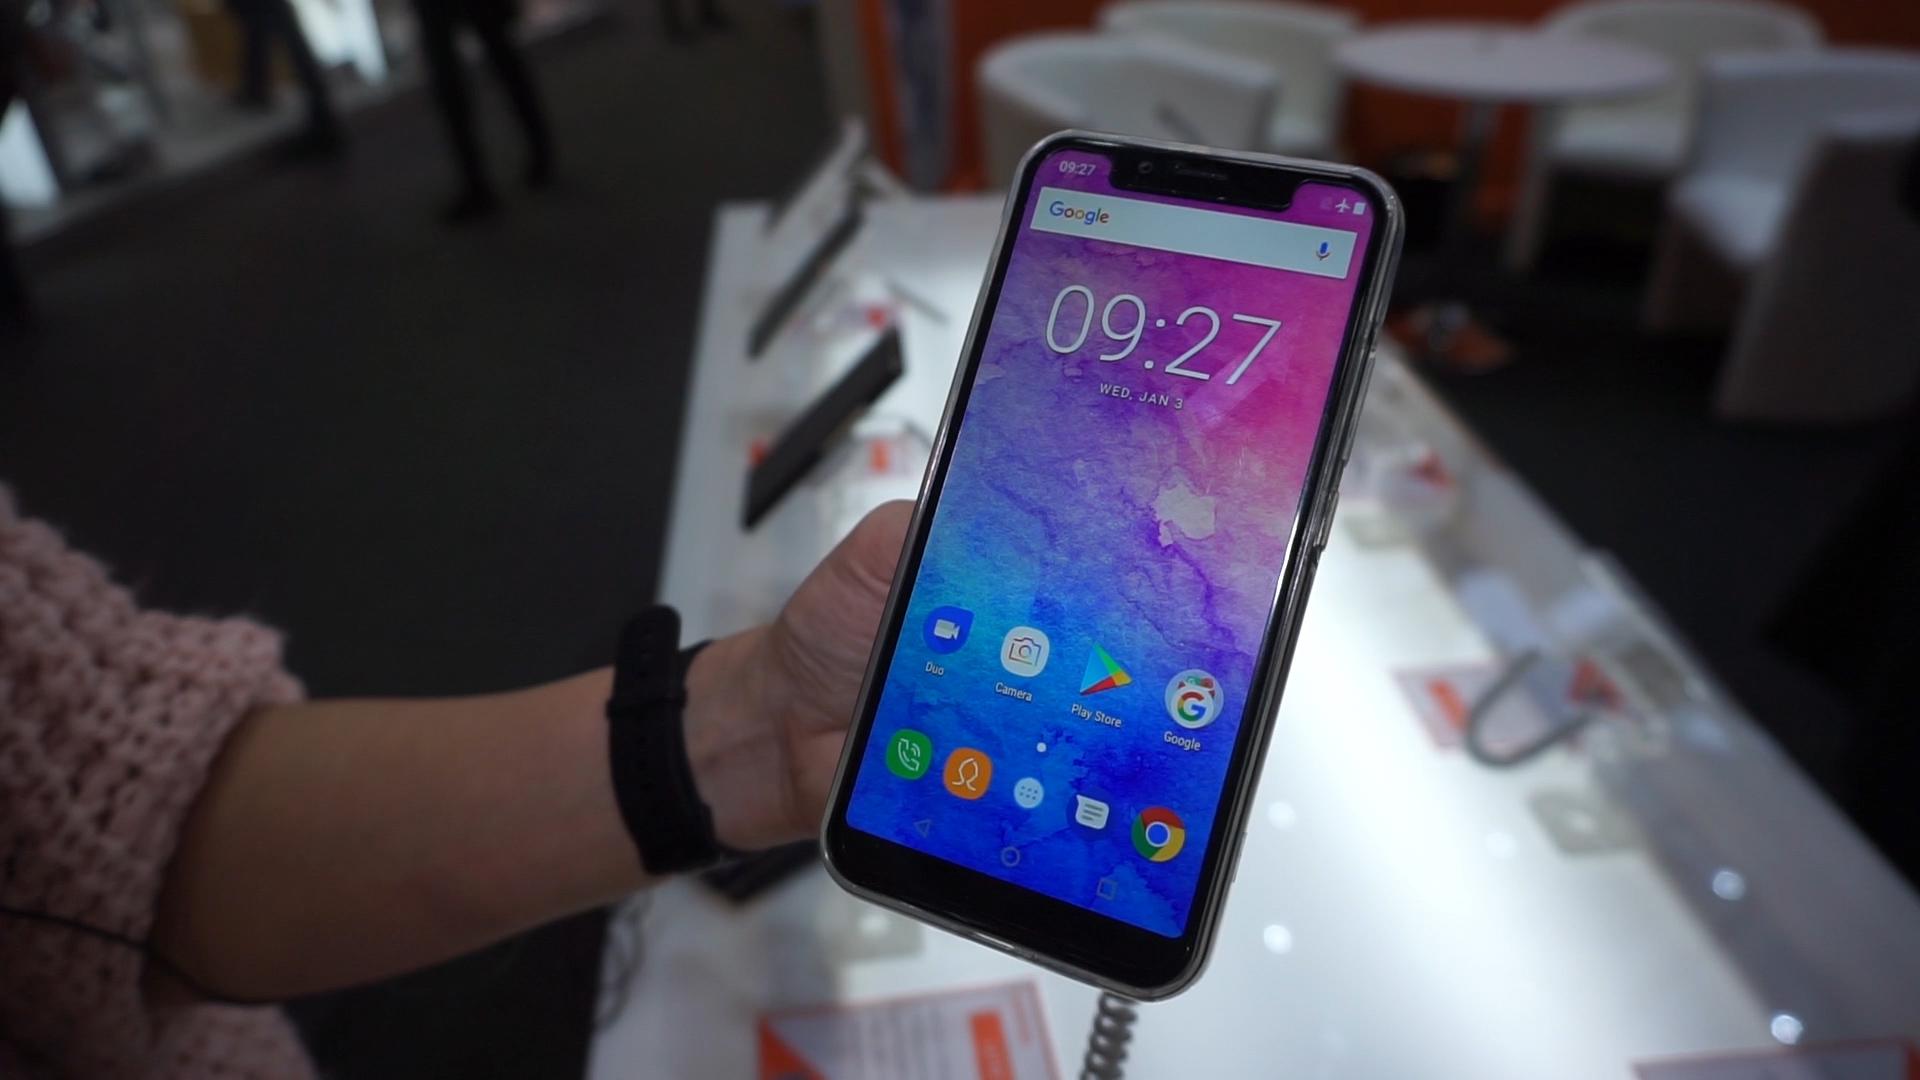 Oukitel U18, la copia Android di iPhone X – Anteprima dal MWC 2018 thumbnail